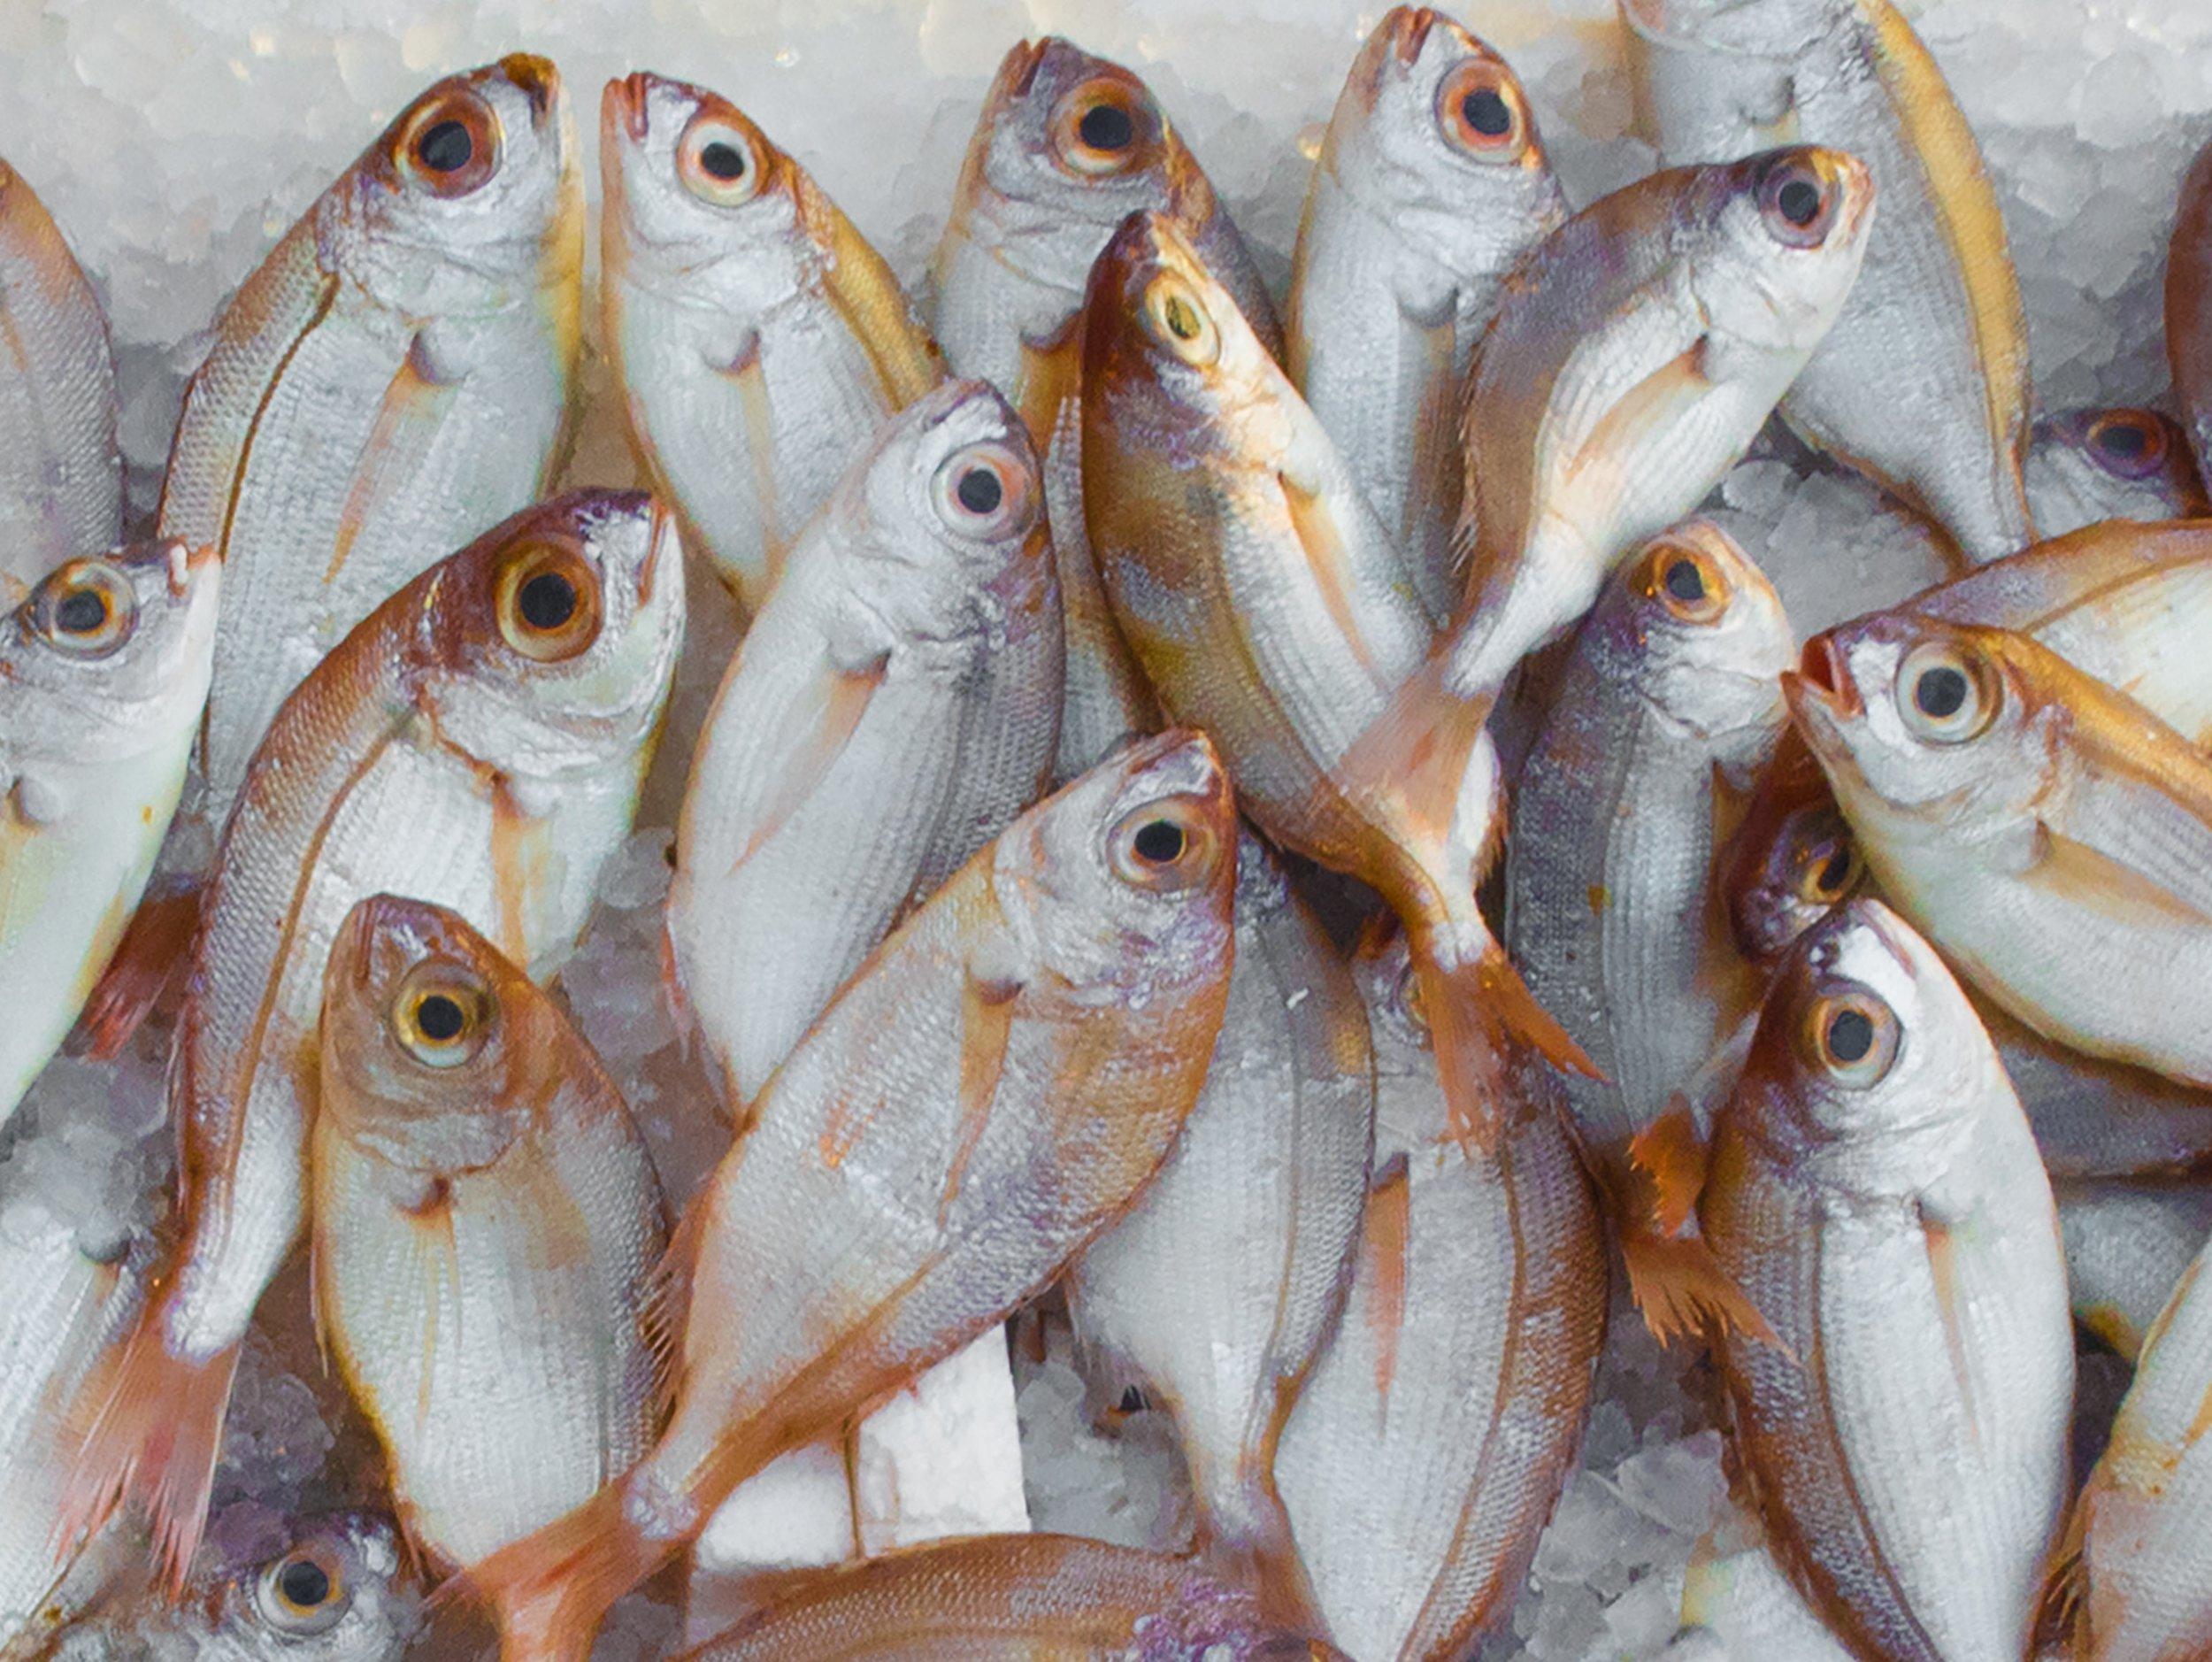 catch-fish-fish-market-229789.jpg